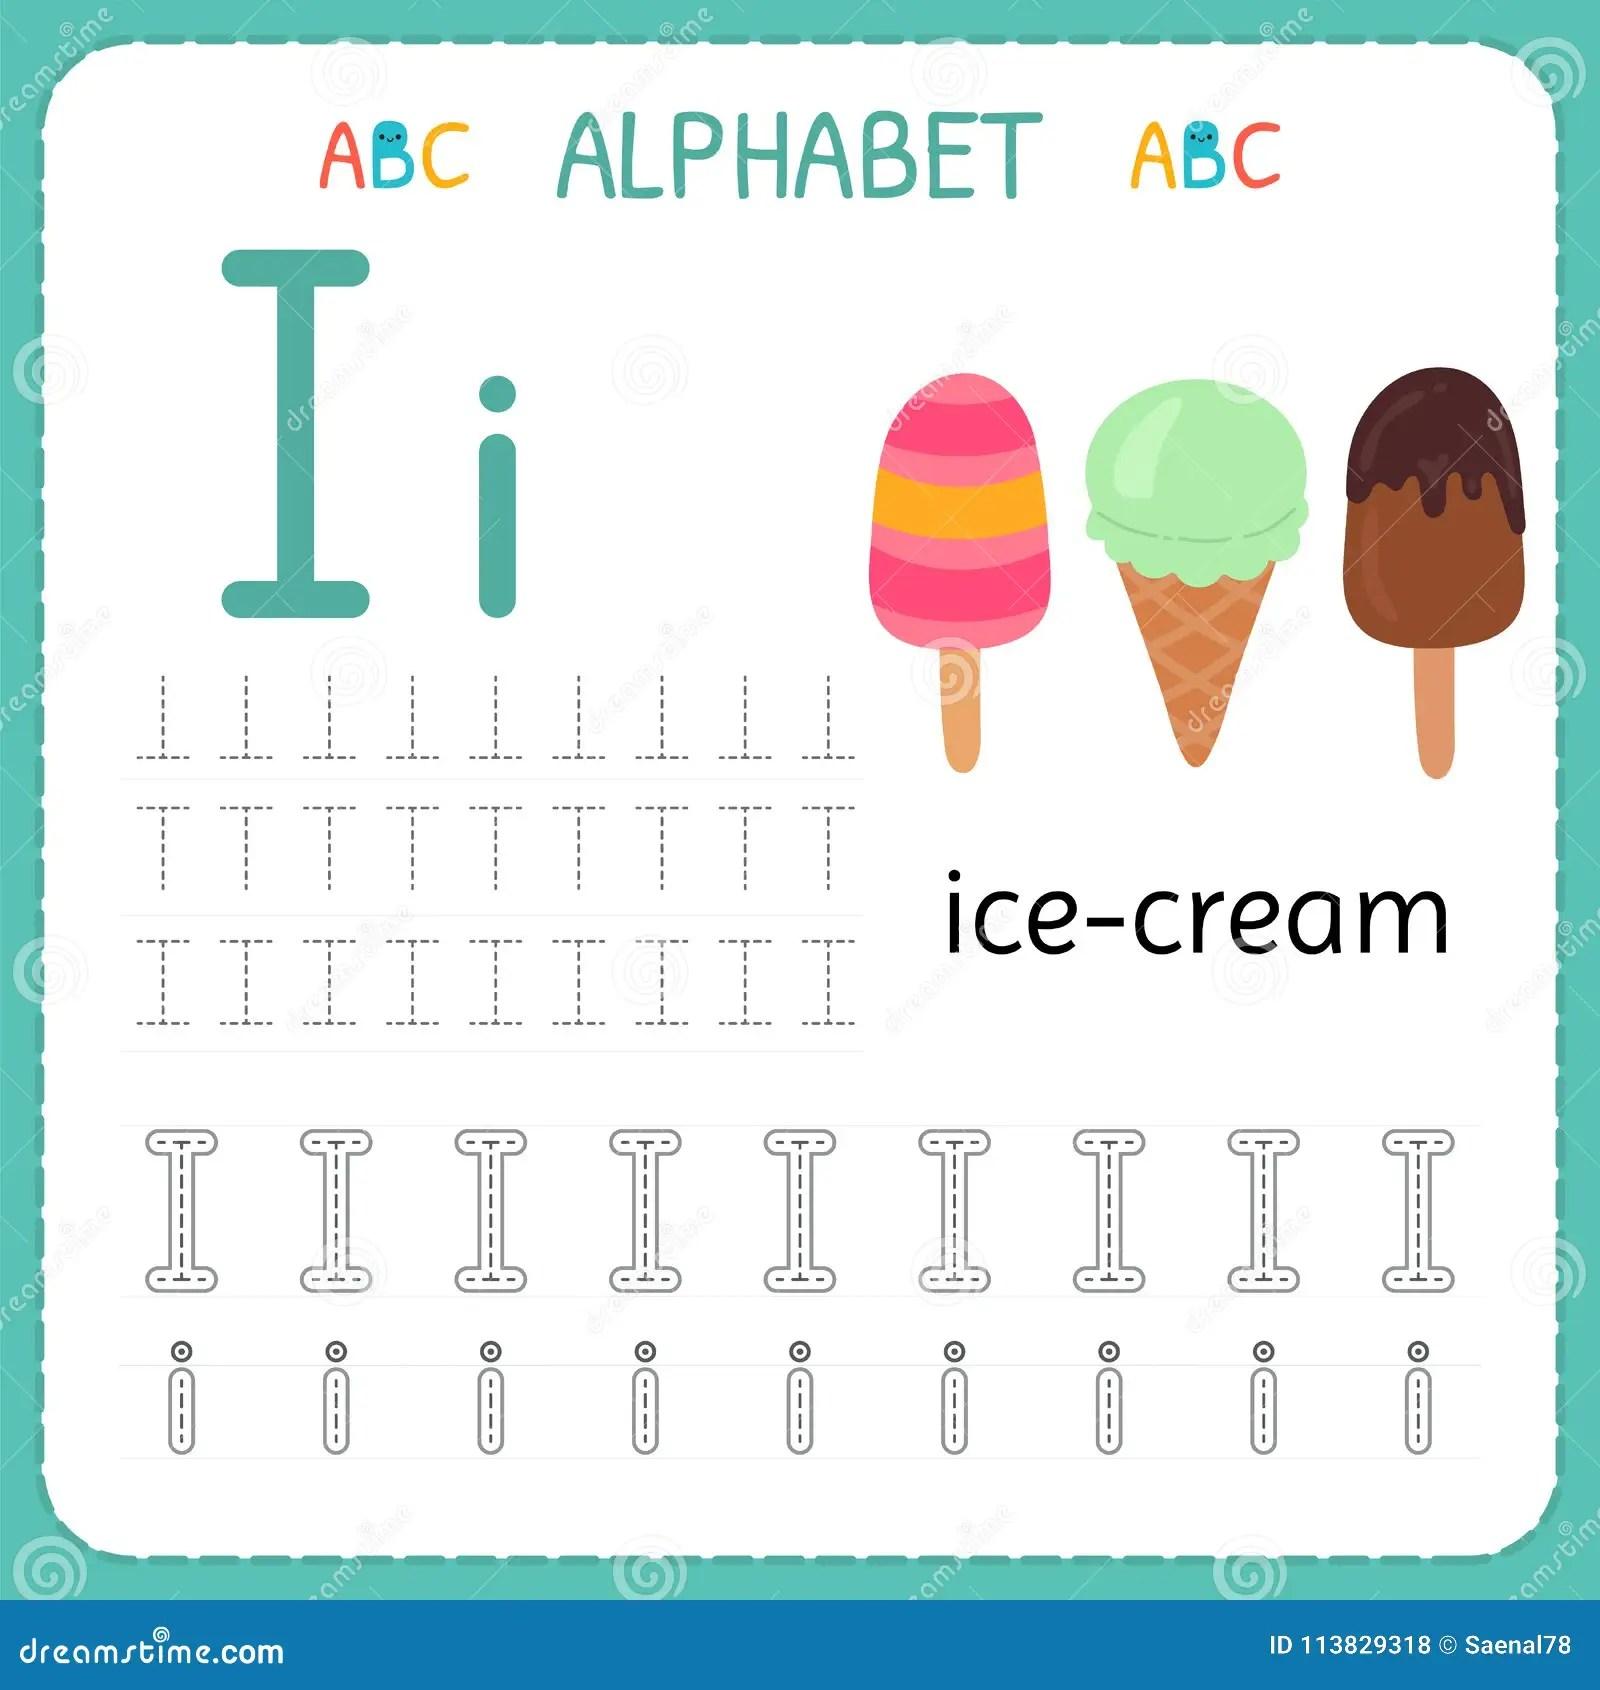 Alphabet Tracing Worksheet For Preschool And Kindergarten Writing Practice Letter I Exercises